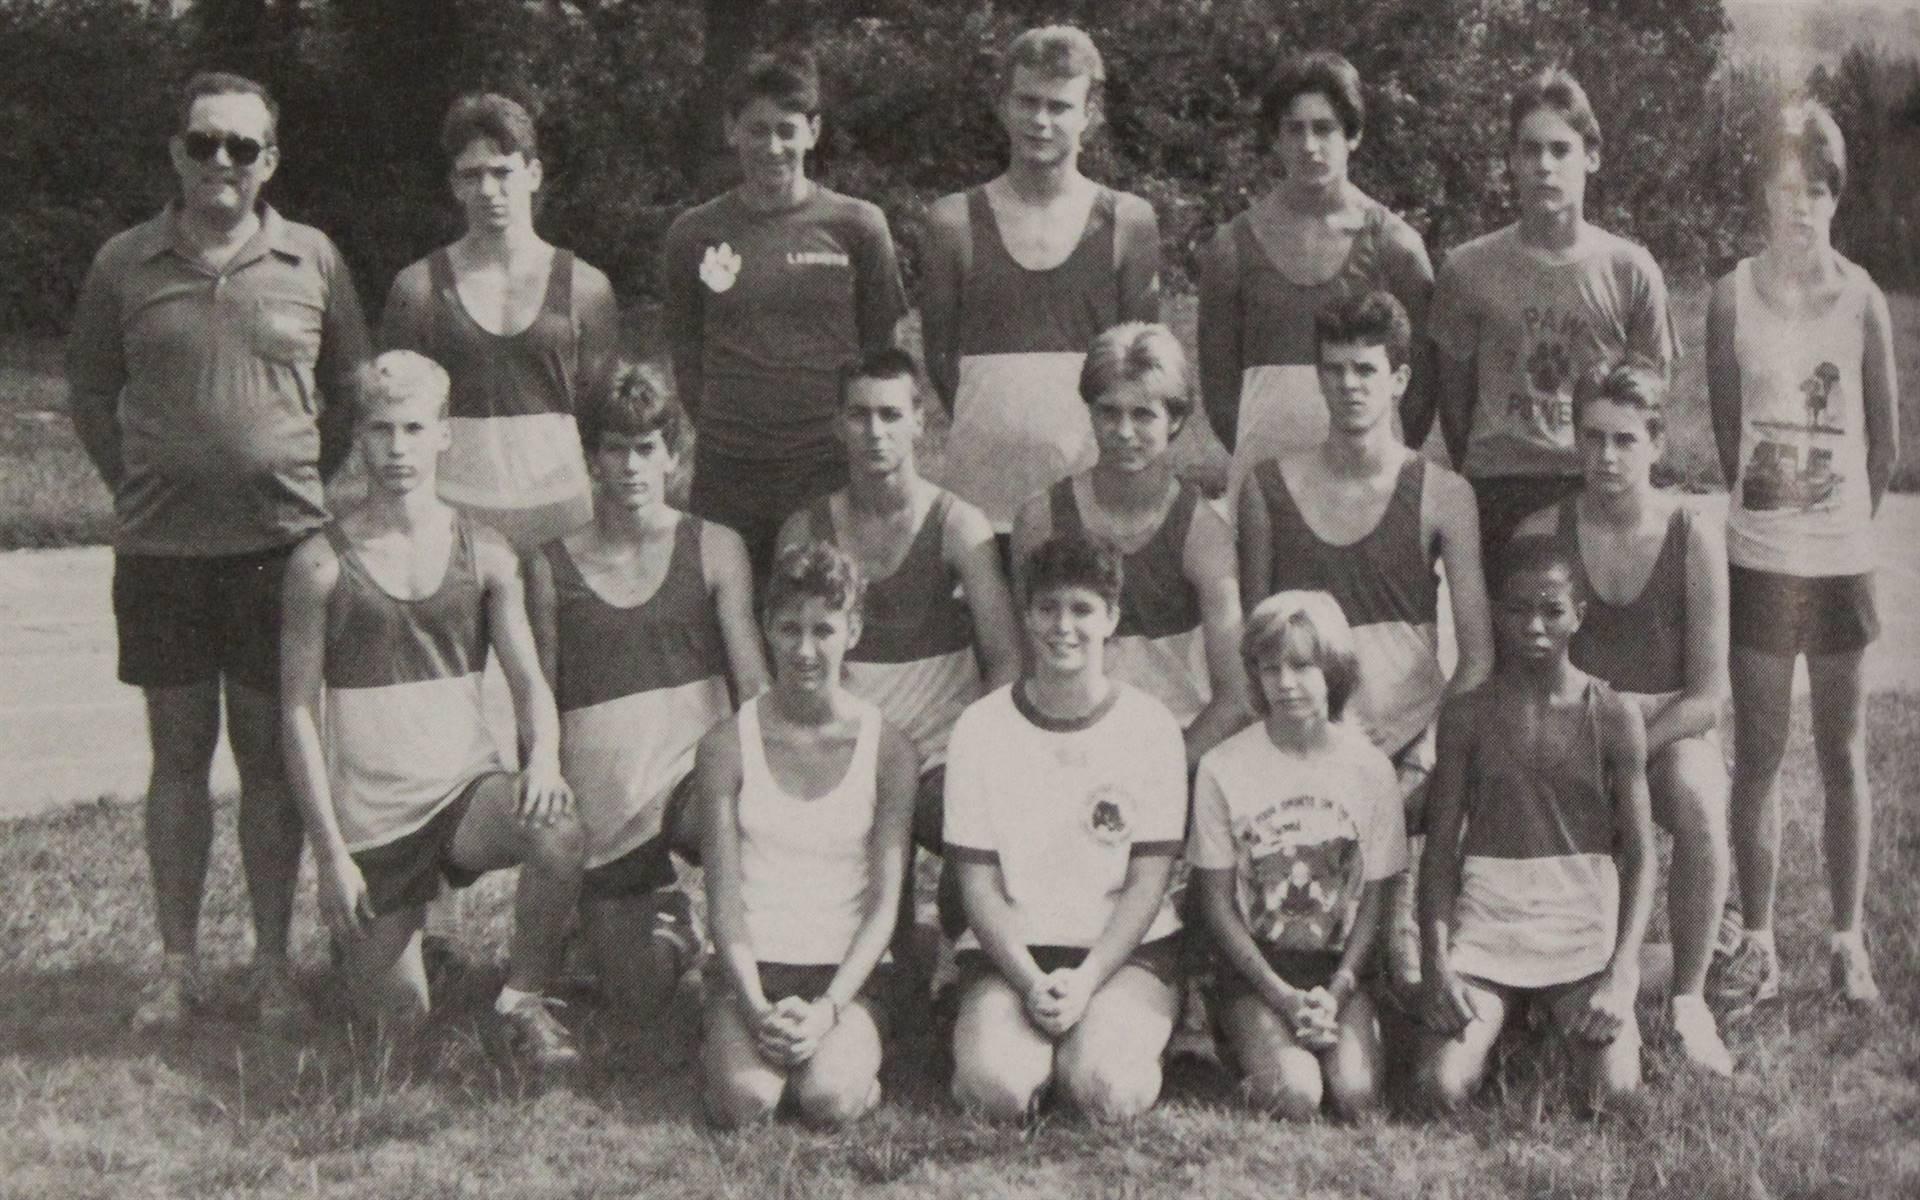 1988 Track